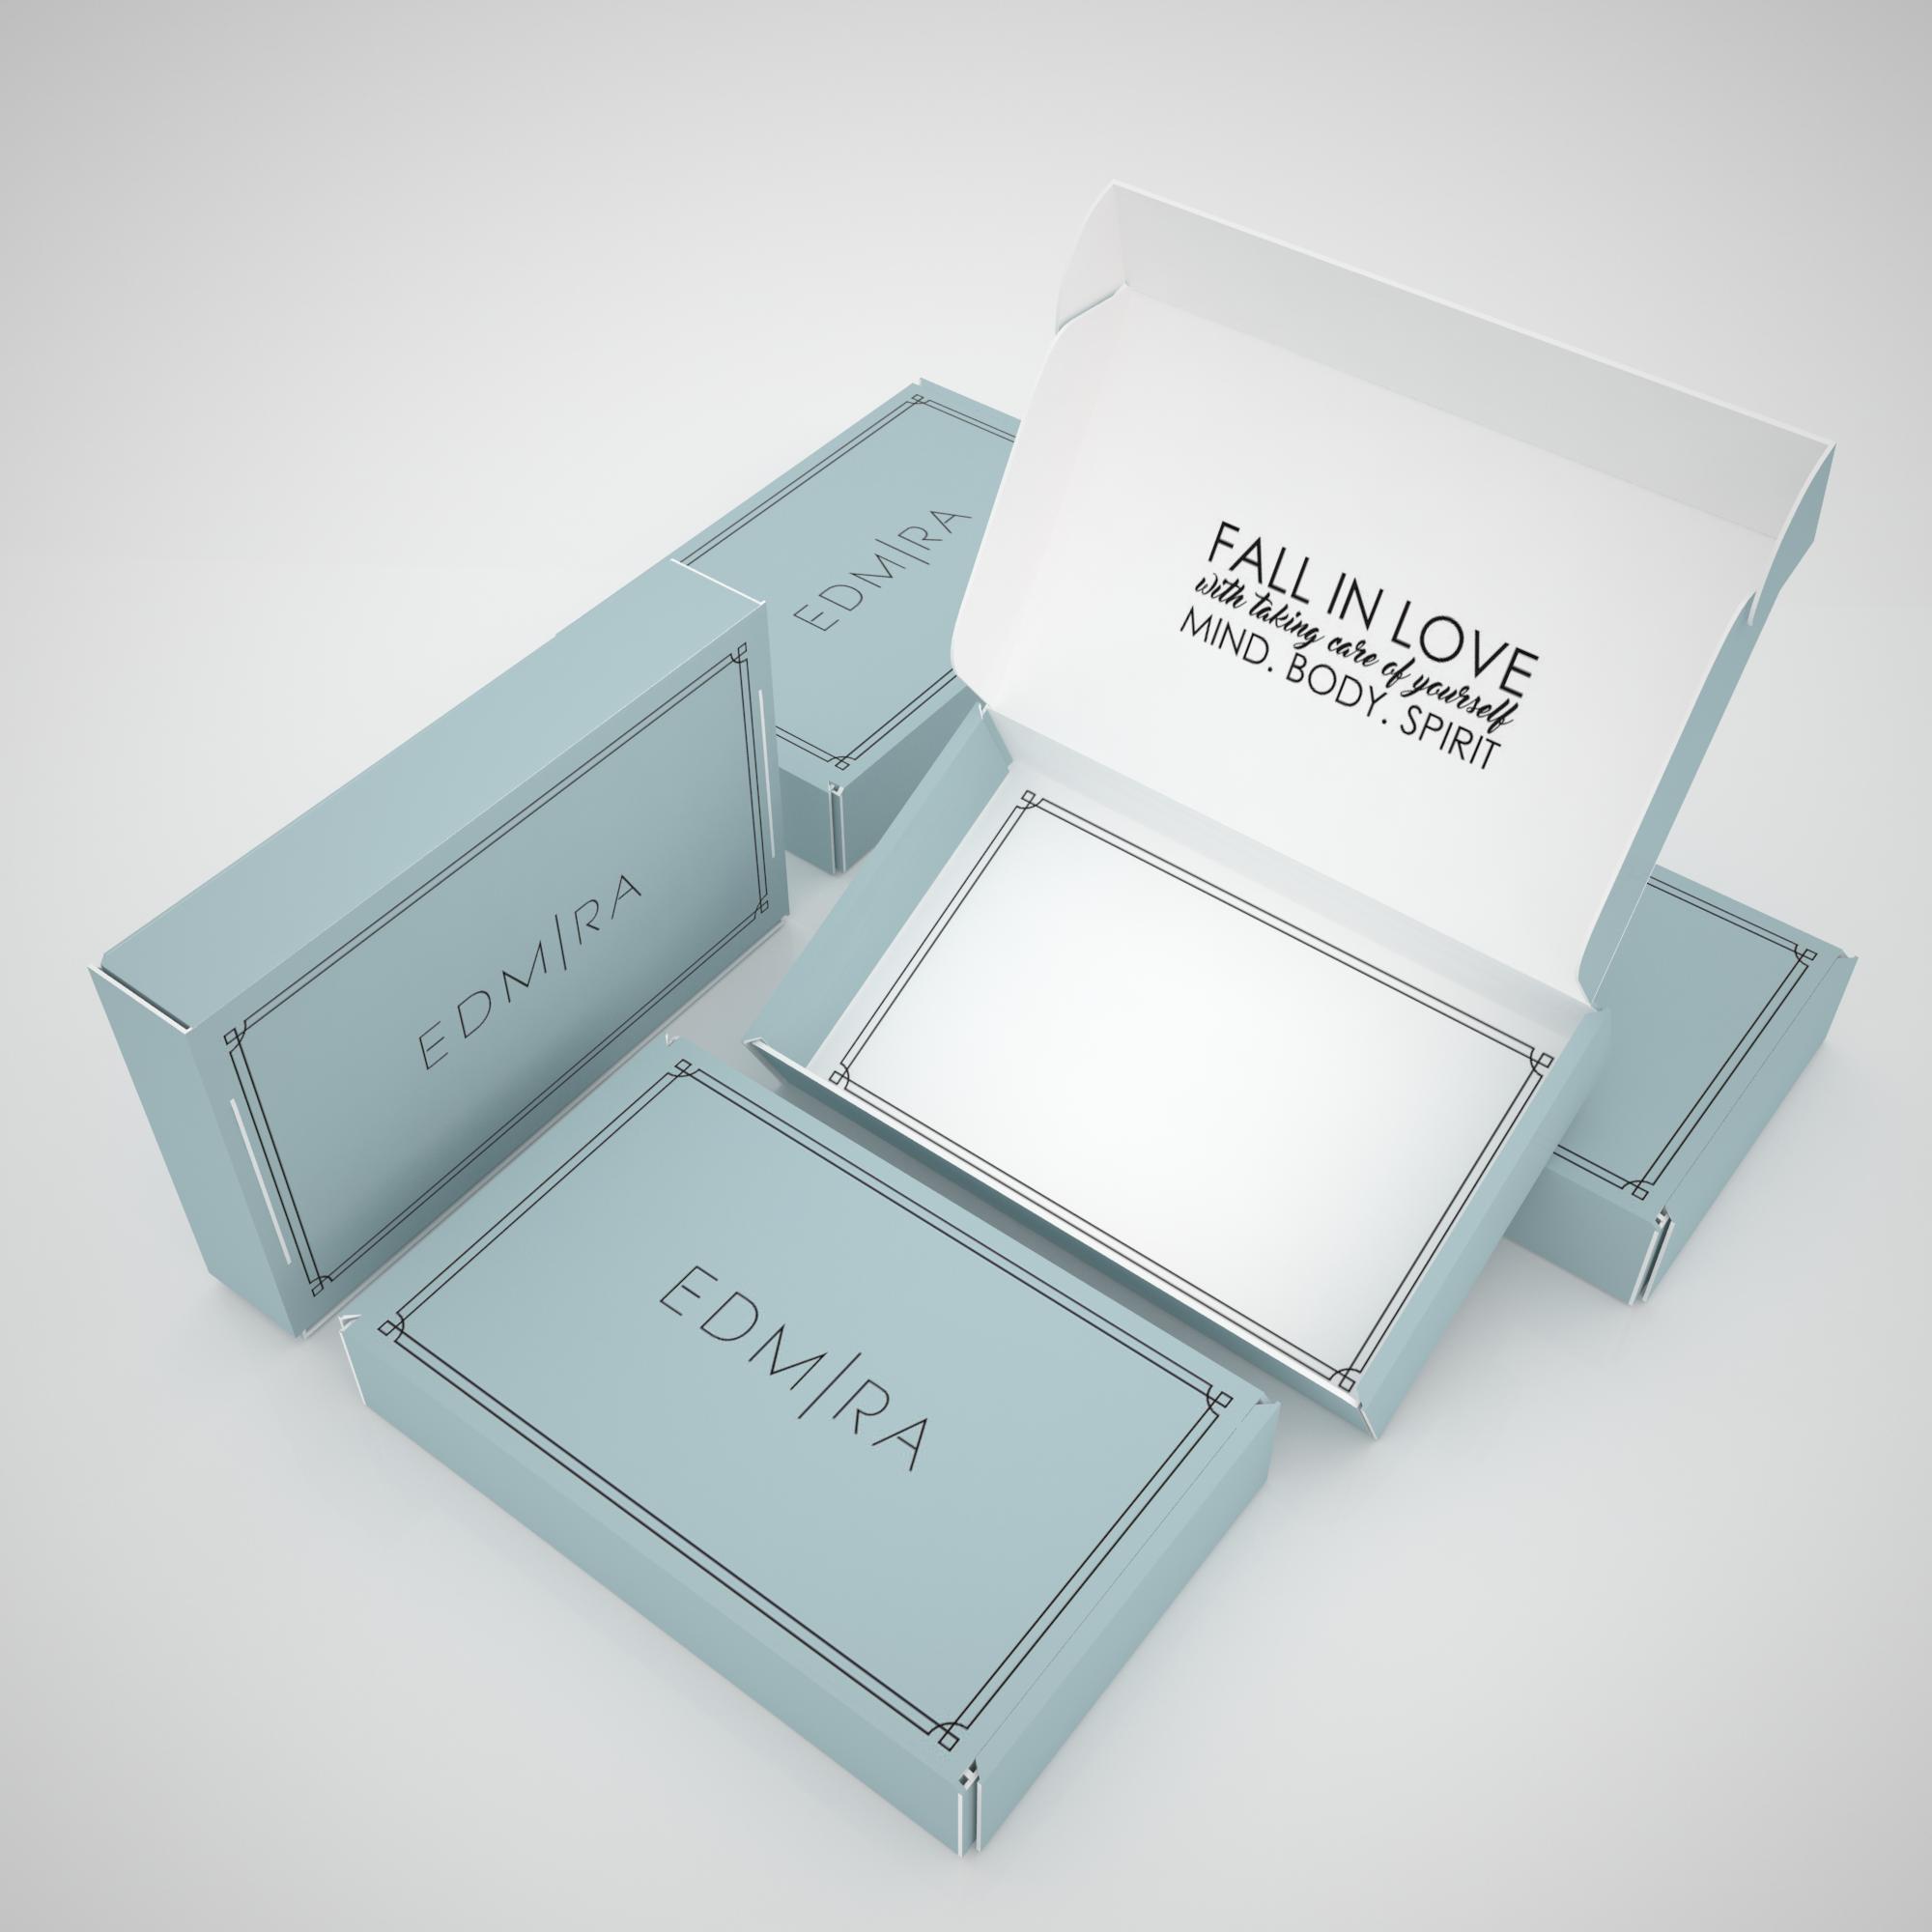 Change colours on box